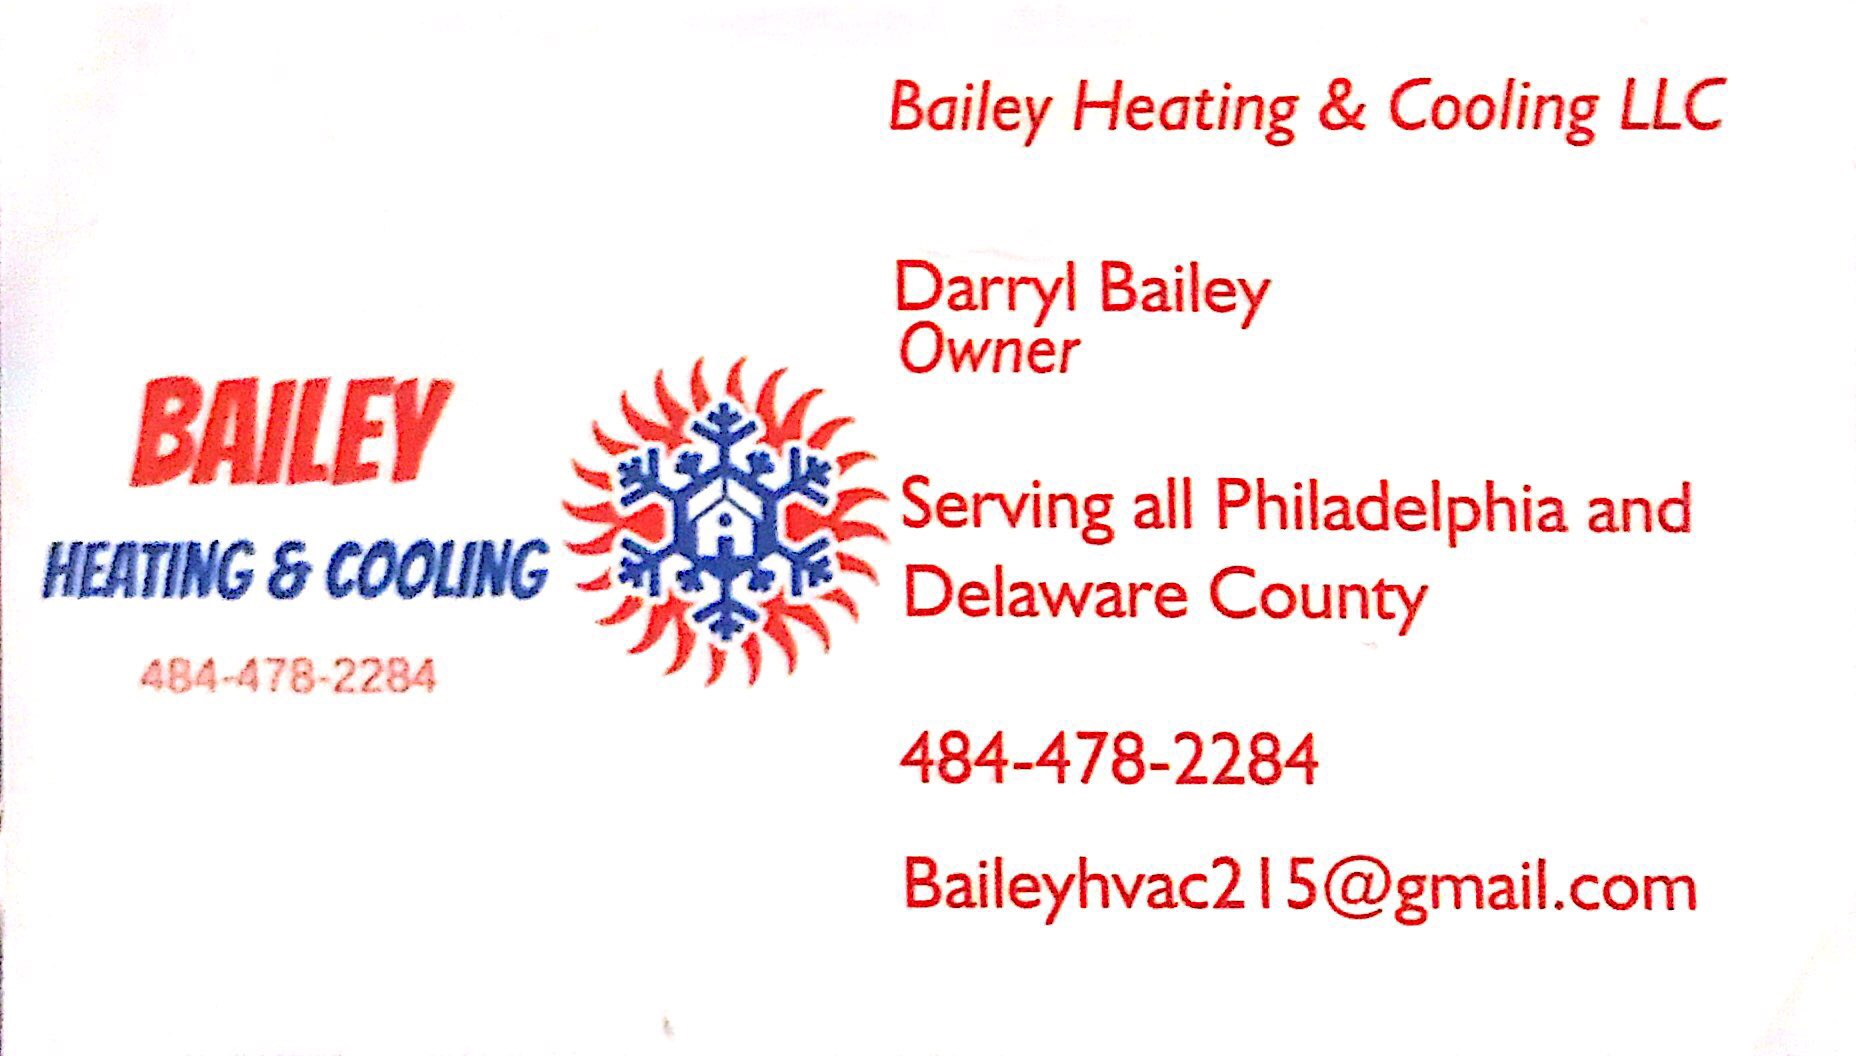 Bailey Heating & Cooling LLC